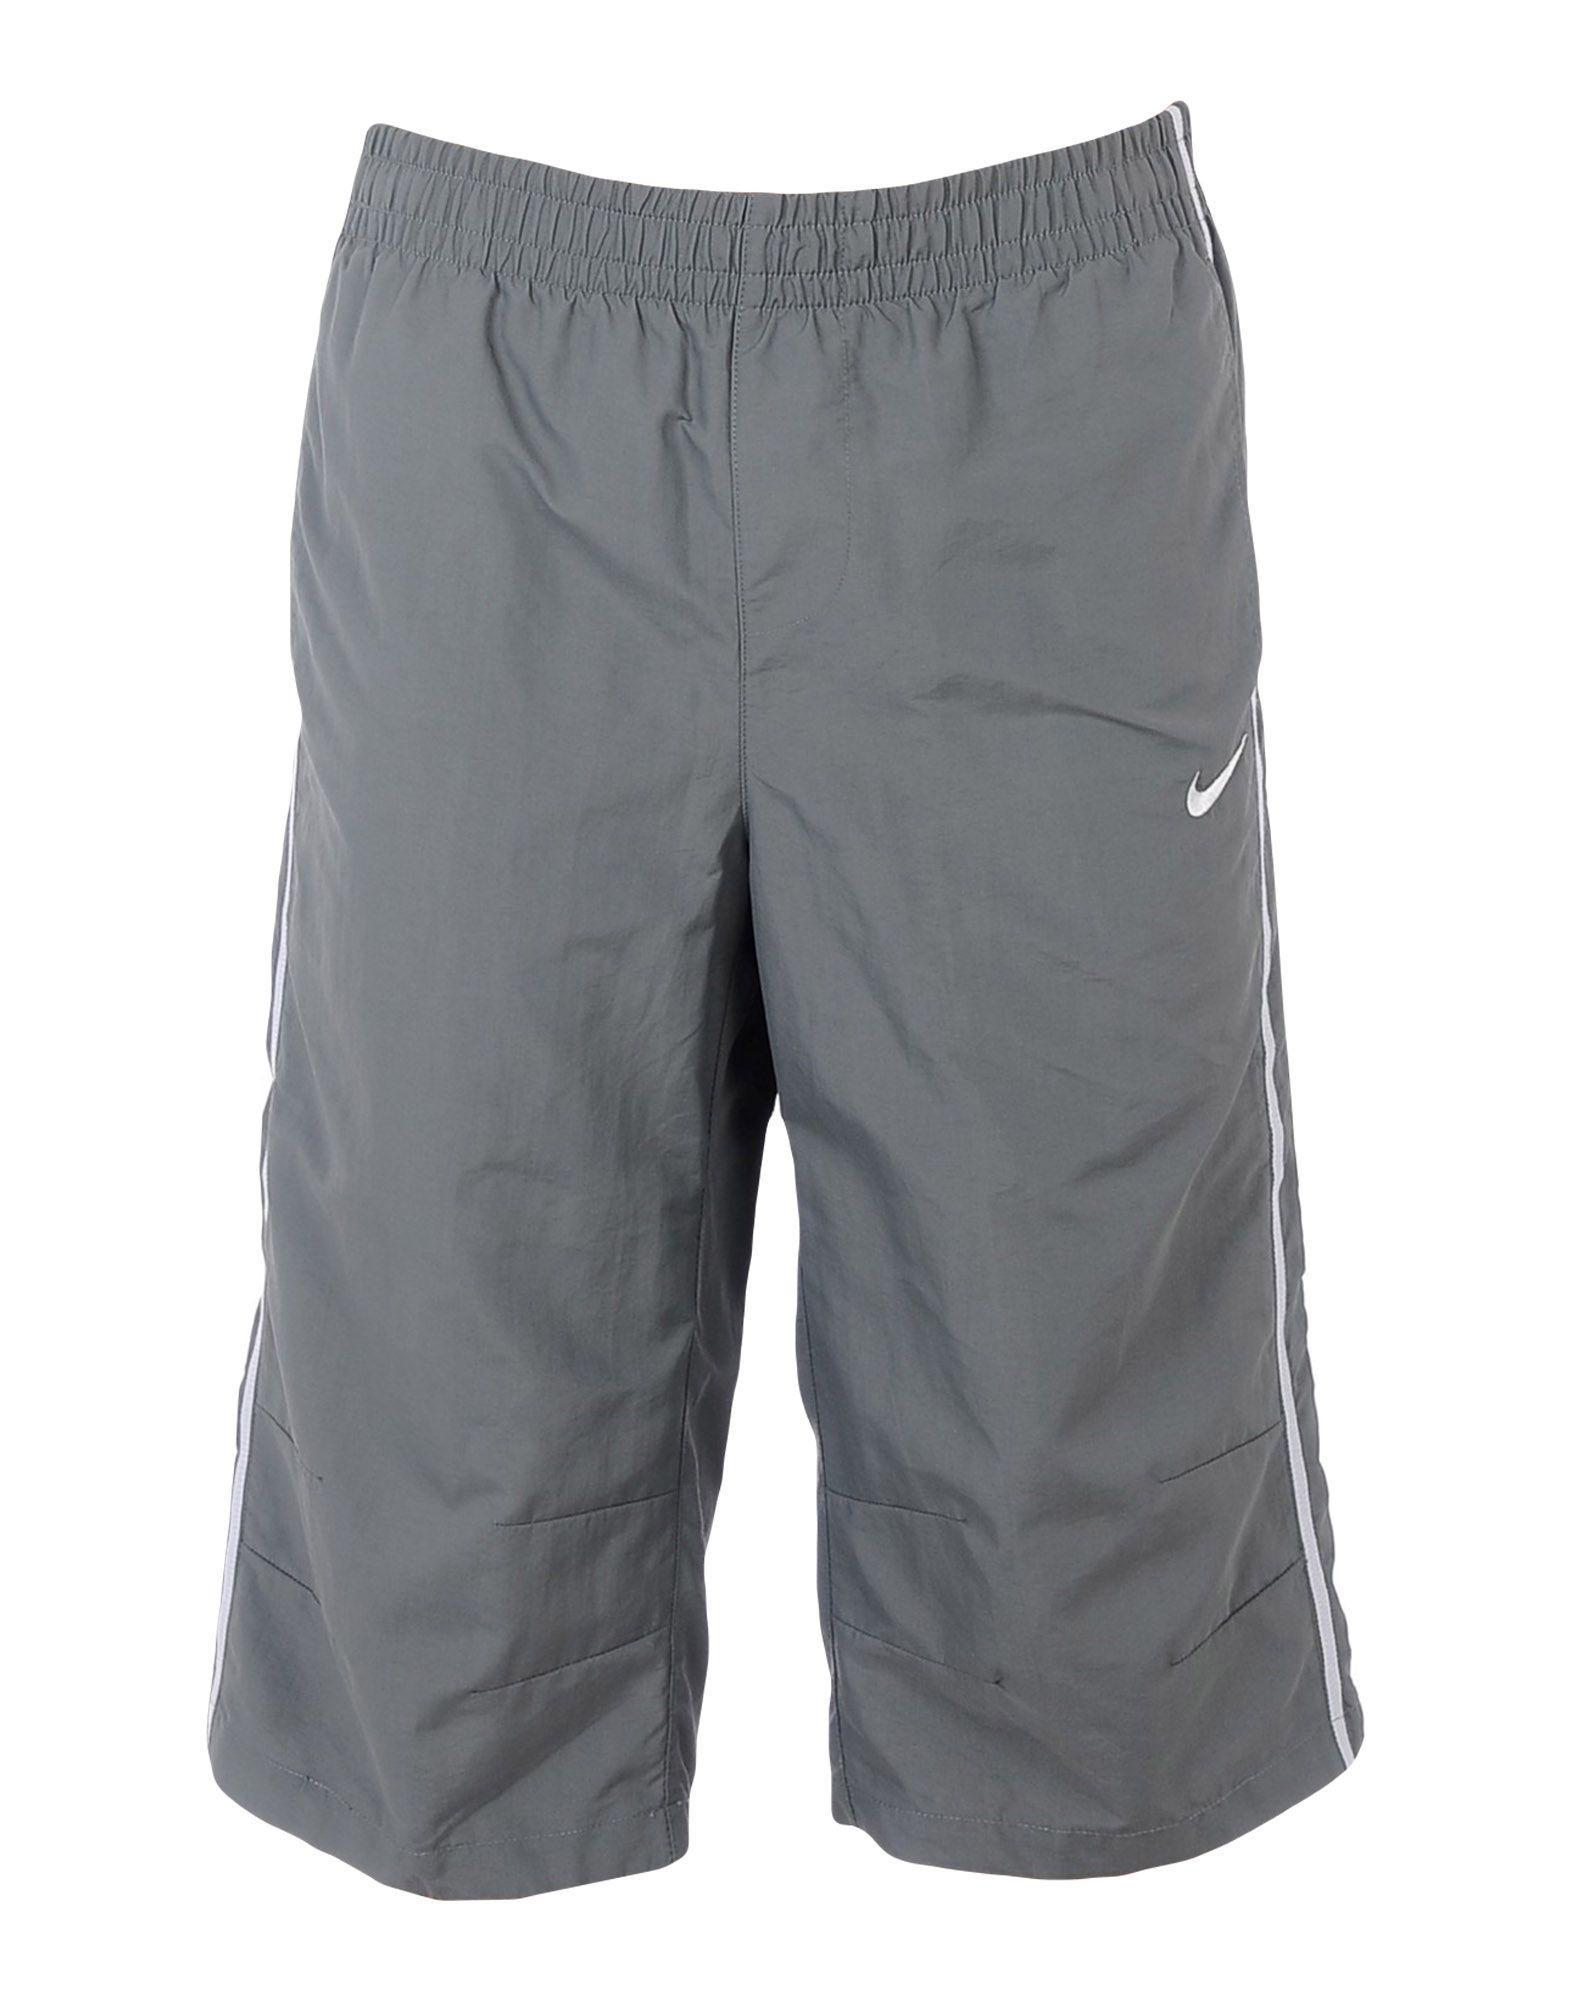 Nike Swim Shorts In Grey